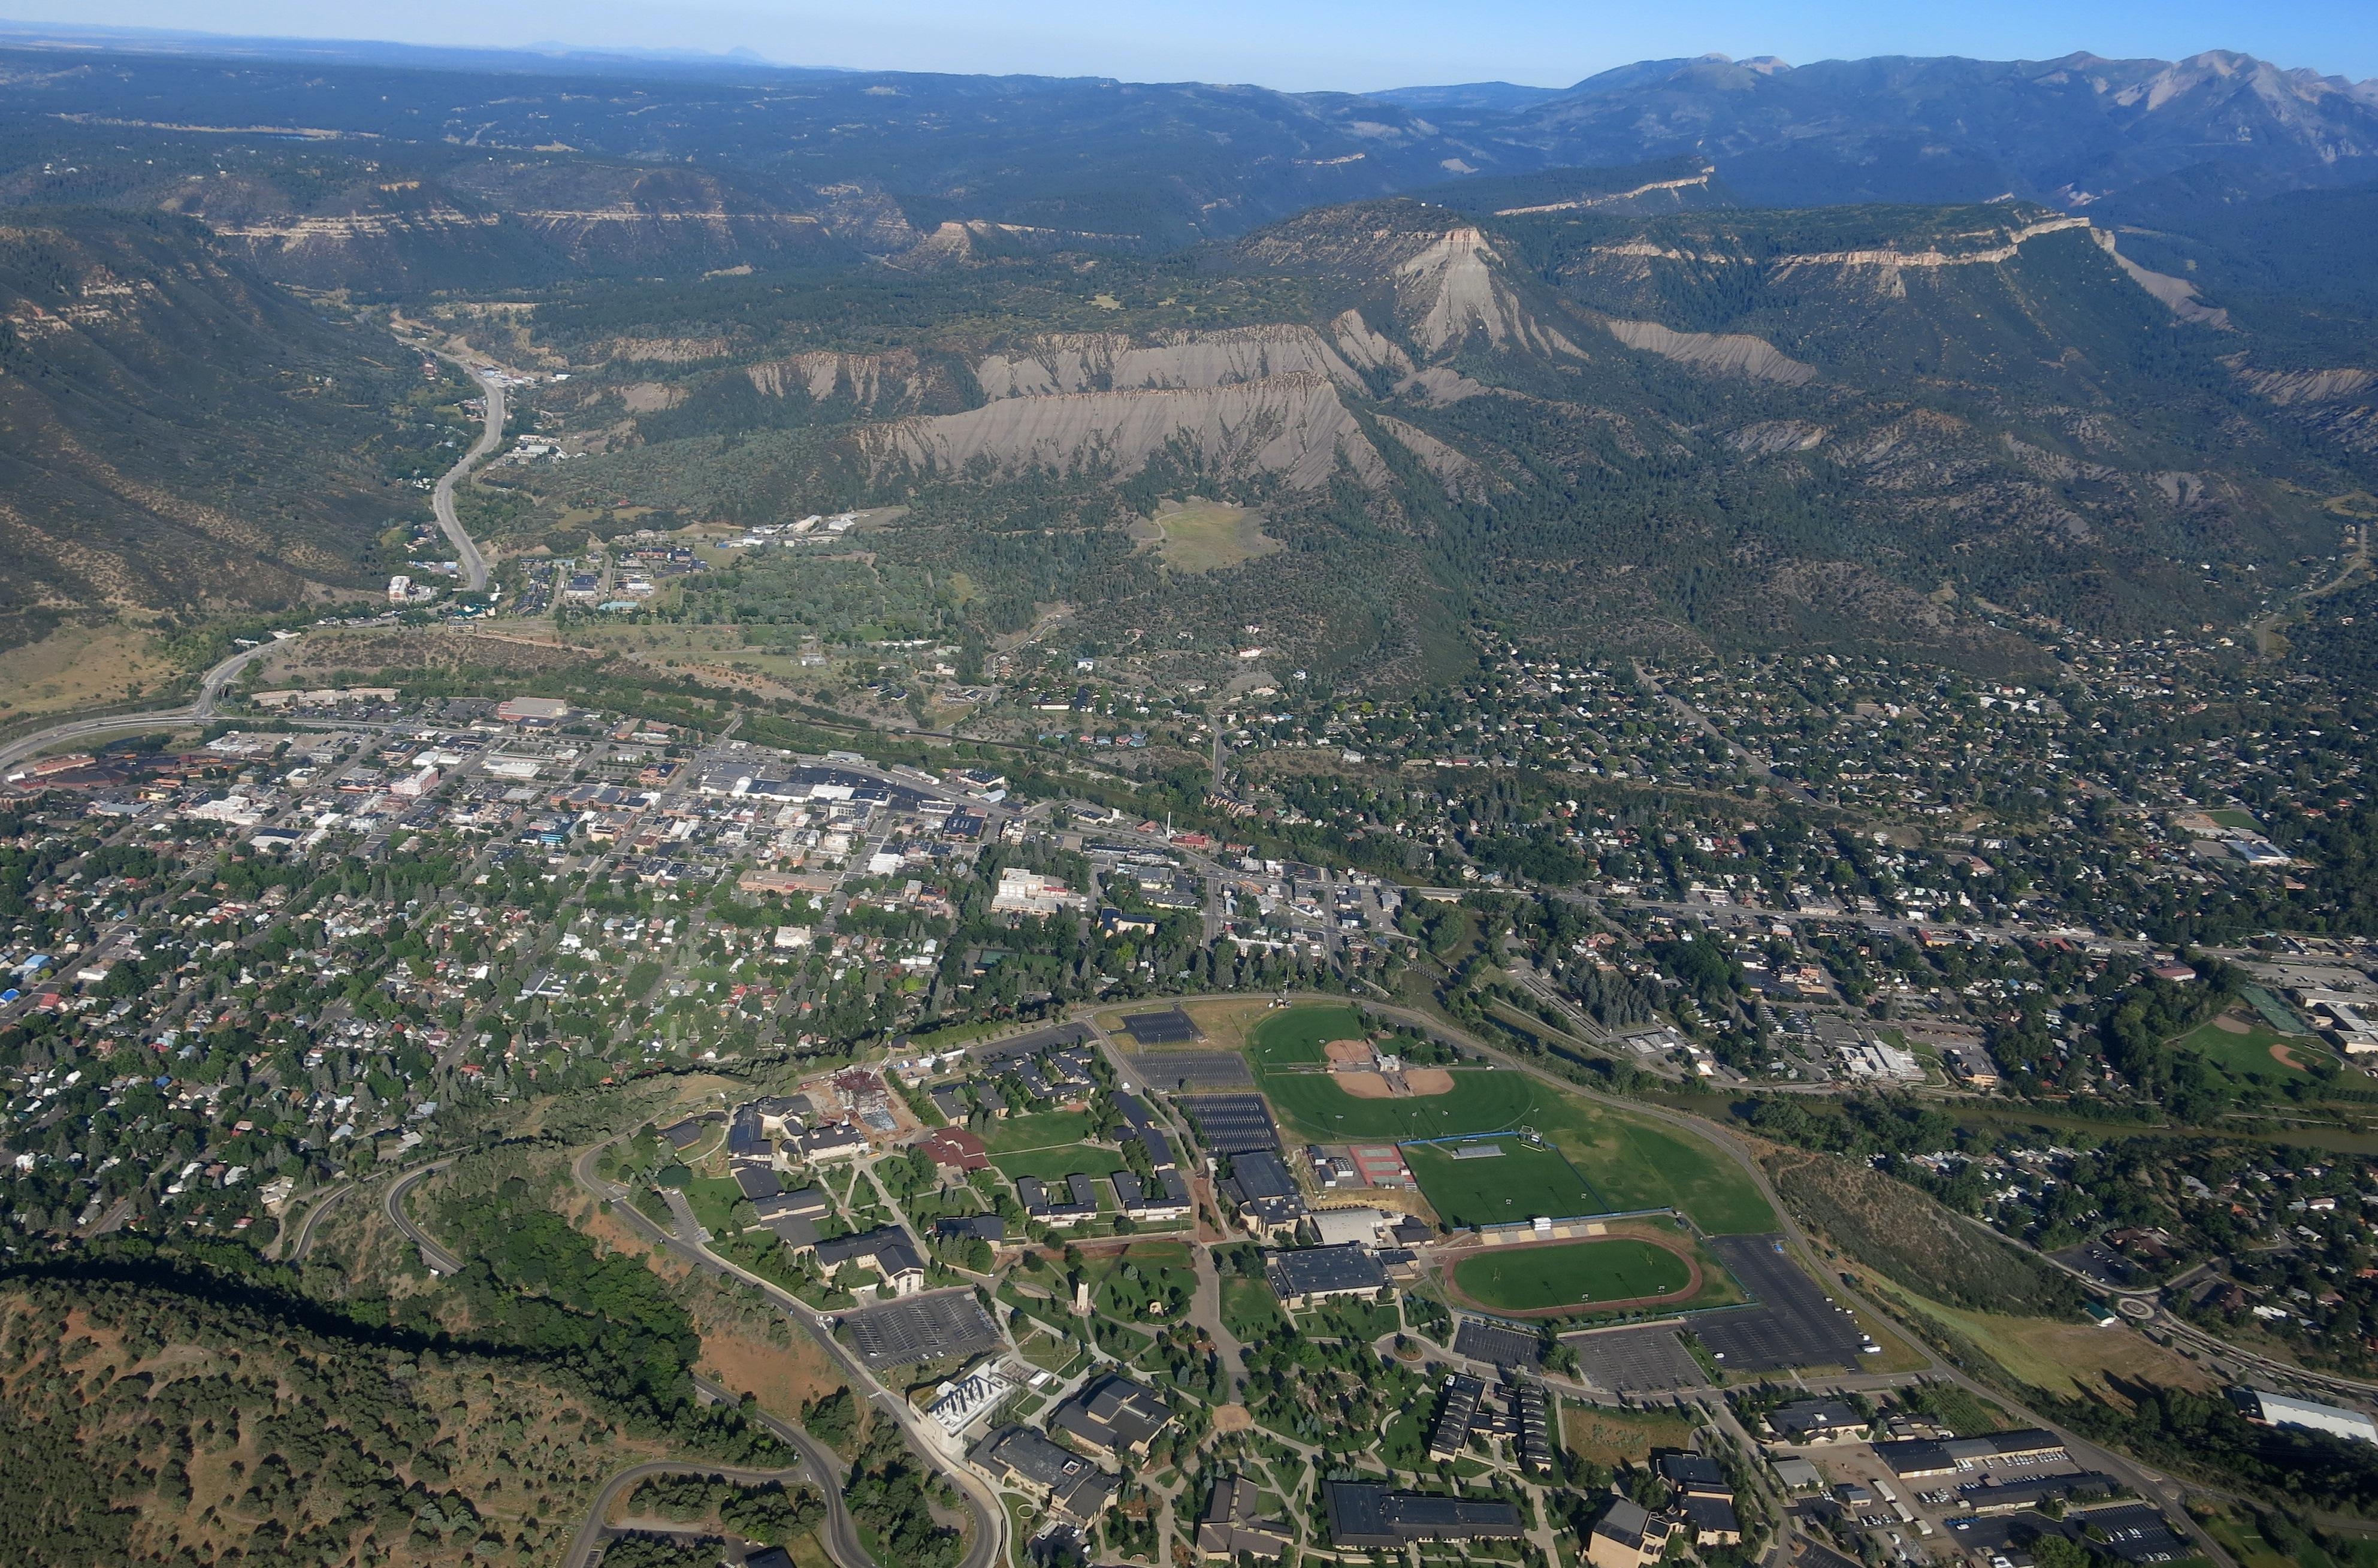 Durango on Aug.9, 2015. The Animas River flows through the city.